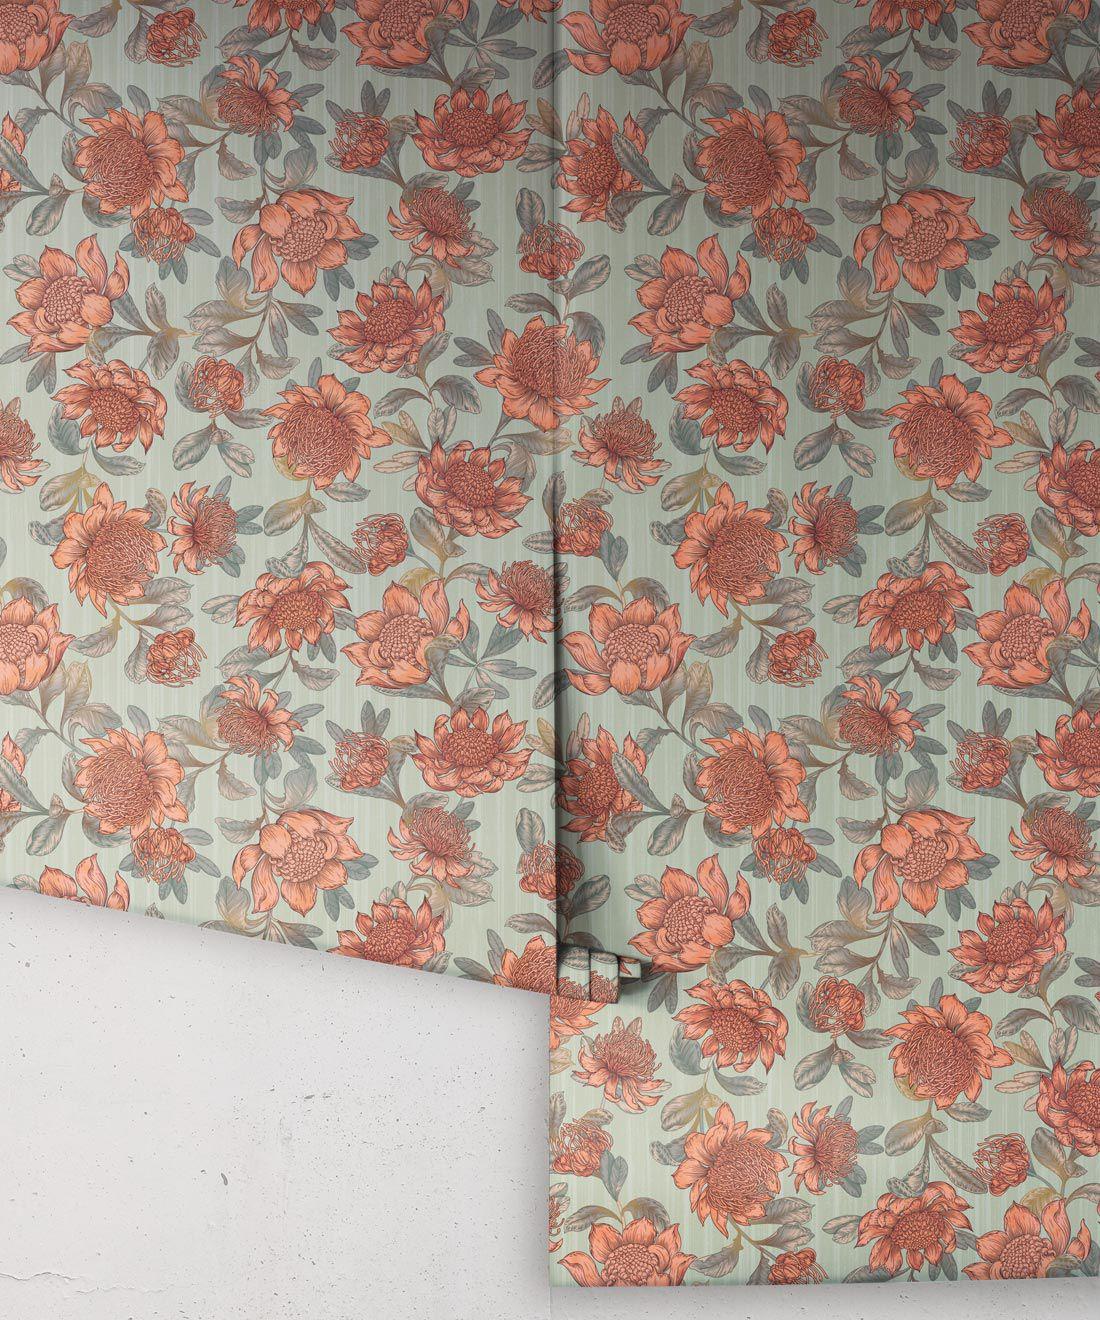 Waratah Wallpaper • Eloise Short • Vintage Floral Wallpaper •Granny Chic Wallpaper • Grandmillennial Style Wallpaper •Green •Rolls